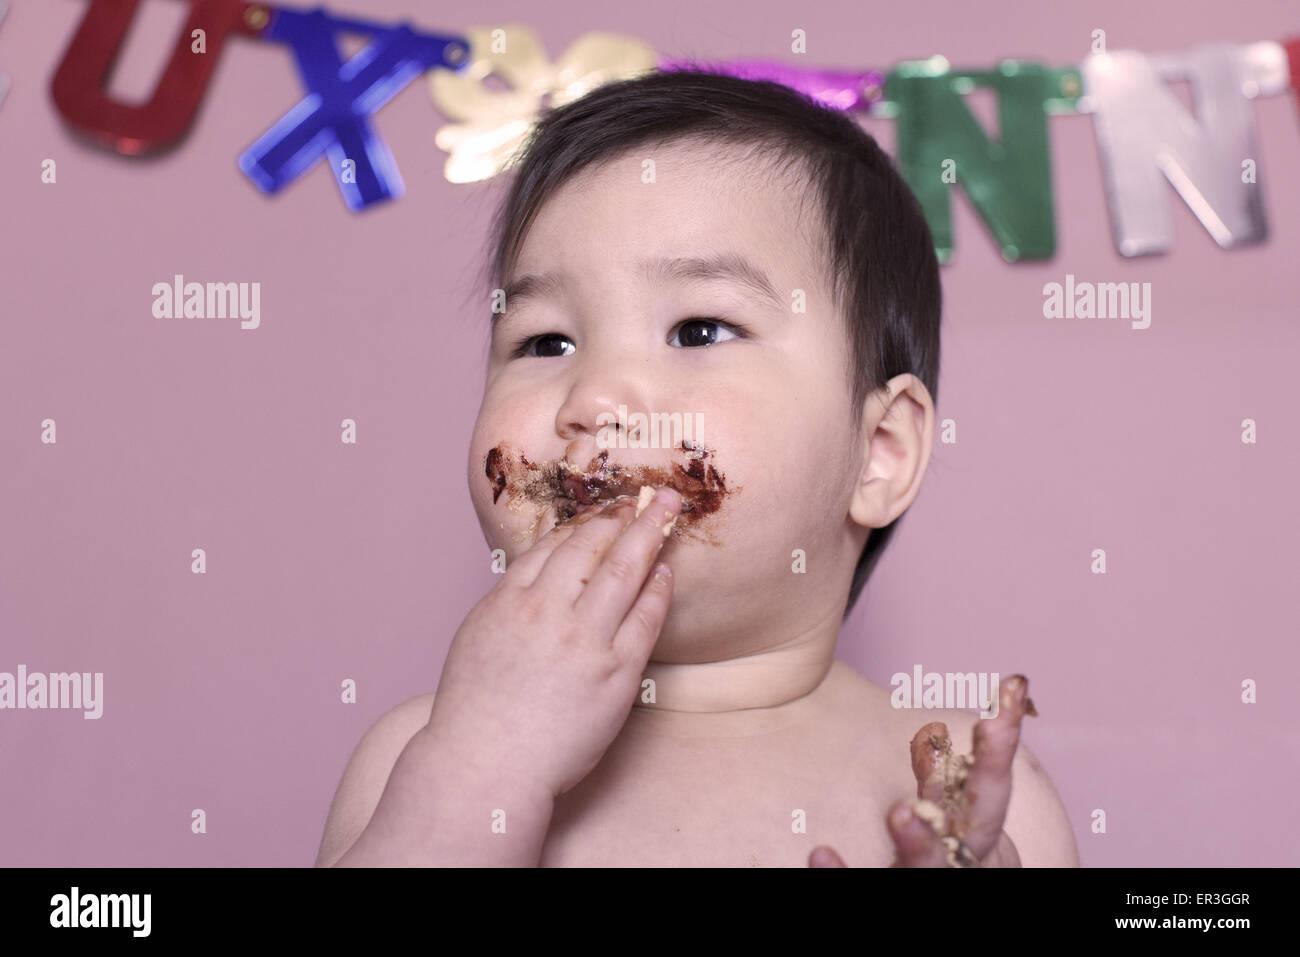 Baby eating birthday cake - Stock Image